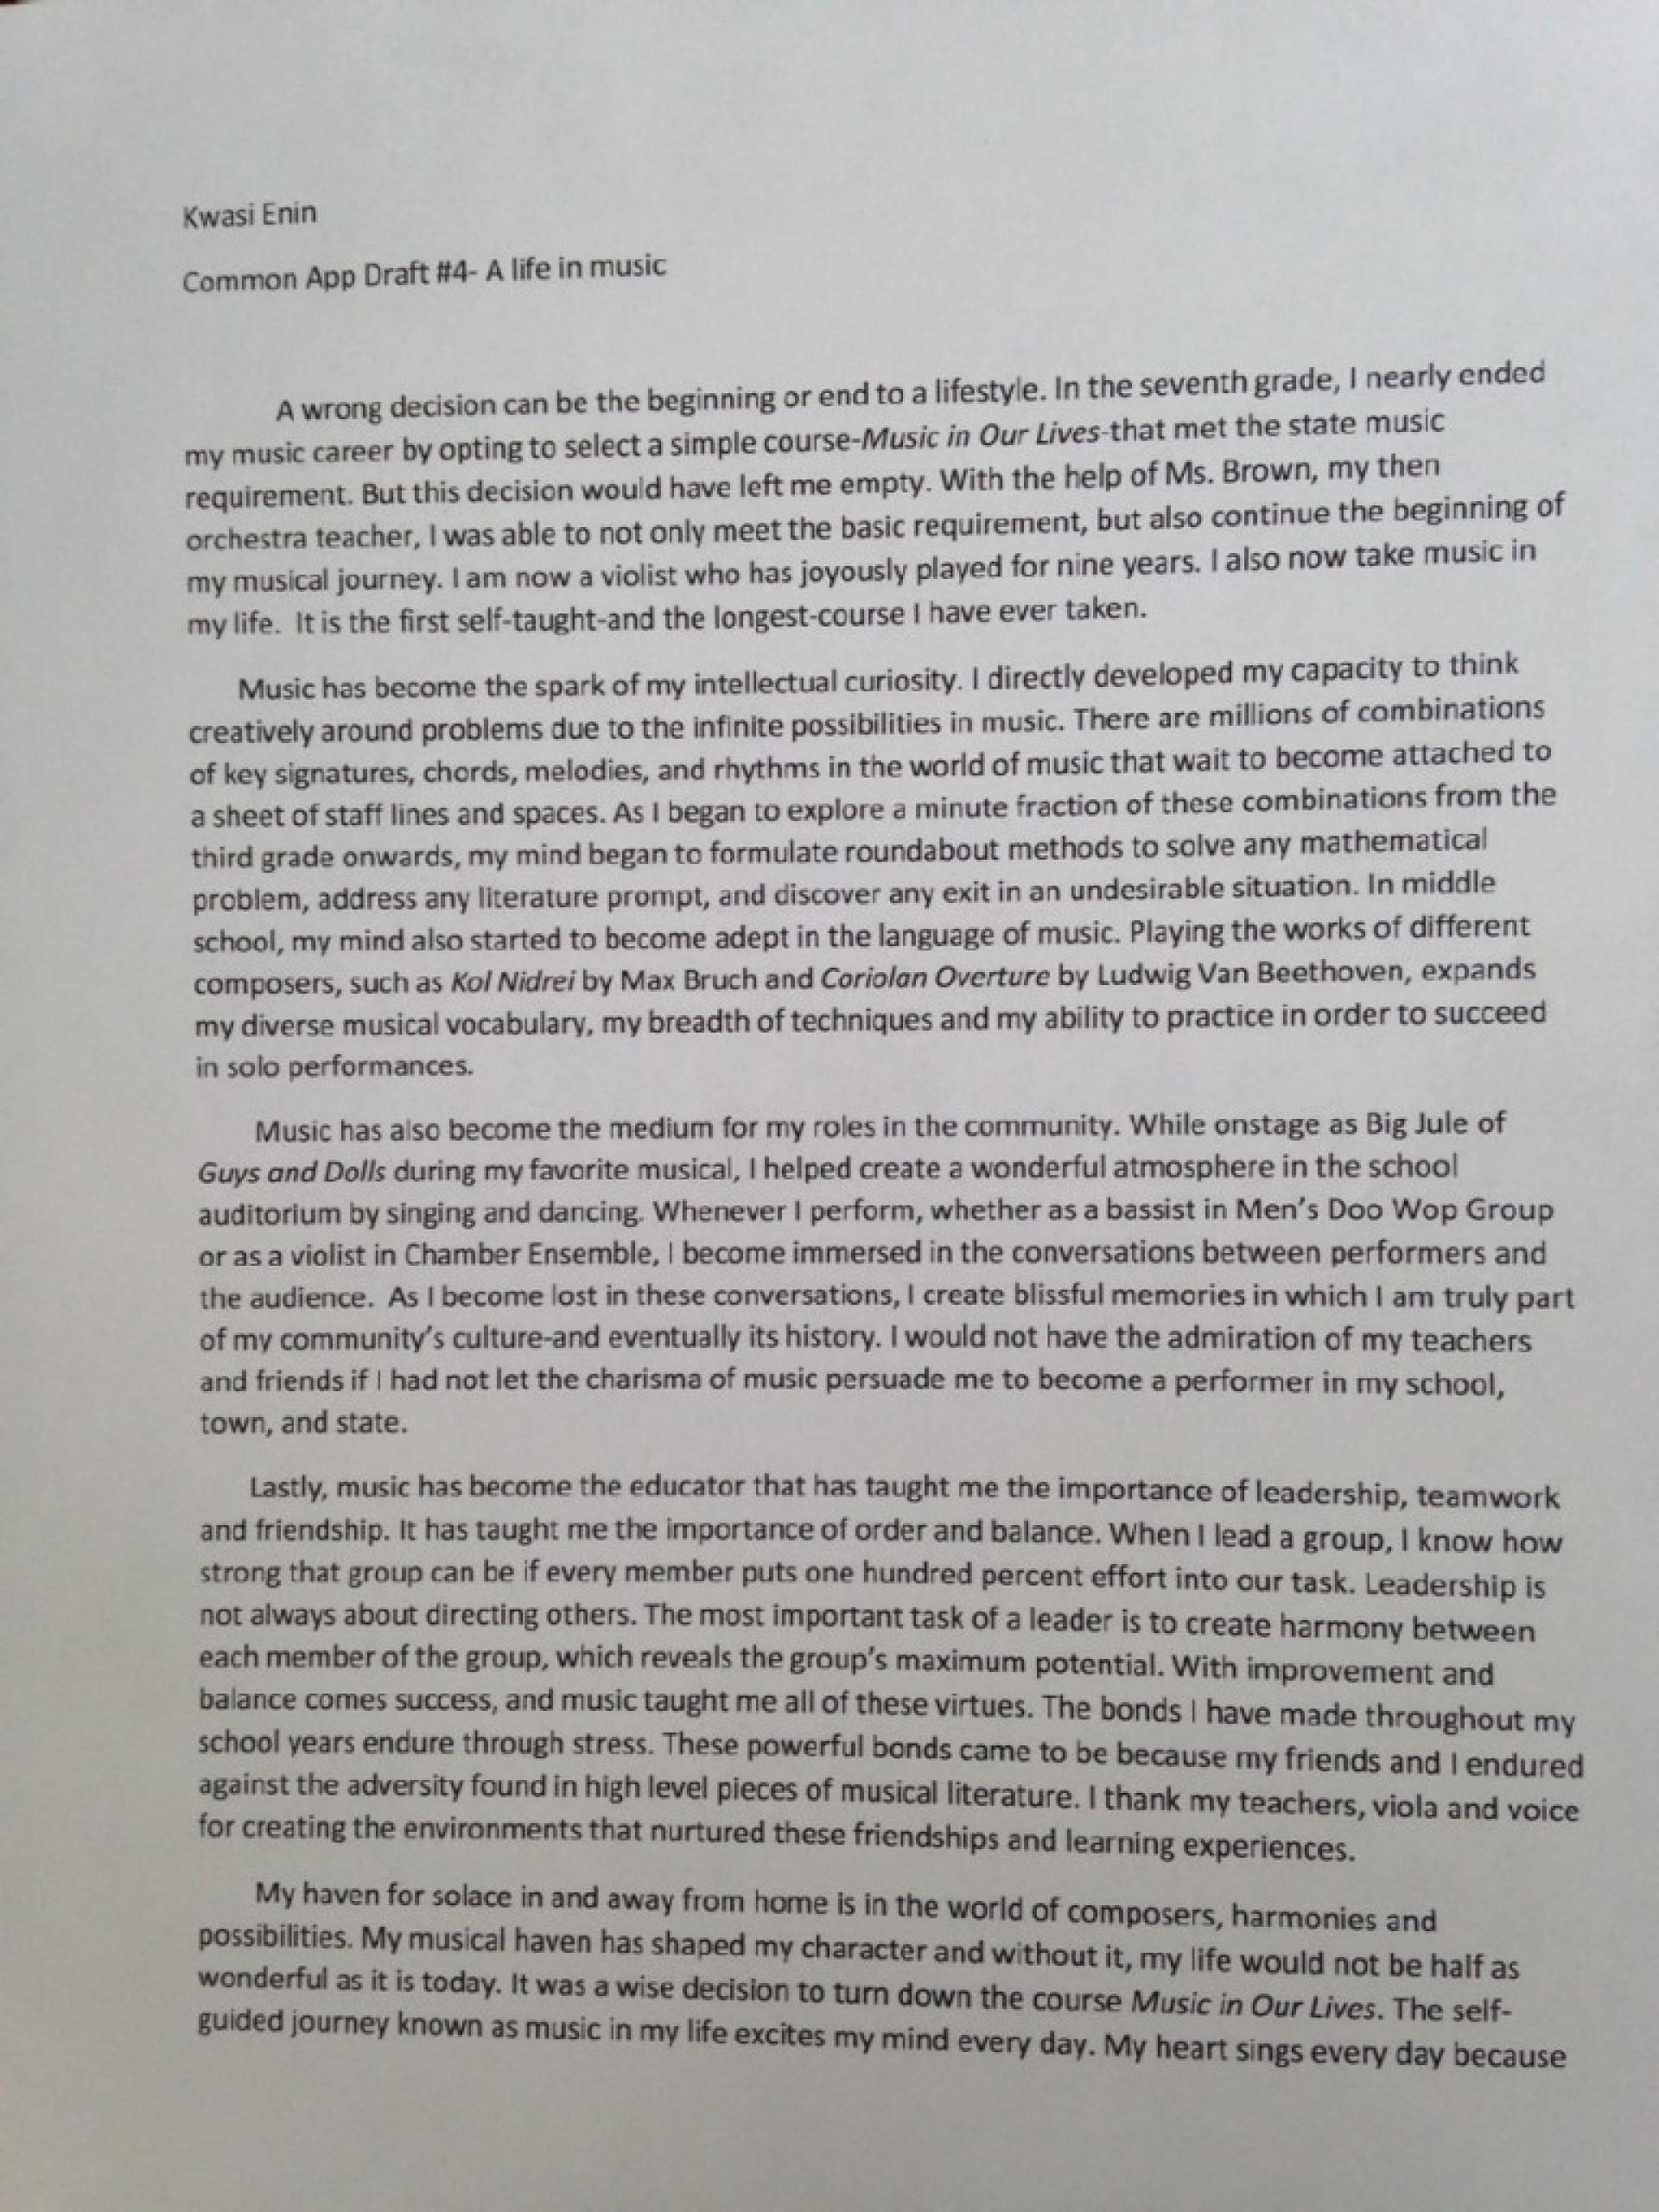 001 Essay Example Ivy League Essays Kwasi Enin Singular Tips Topics Help 1920